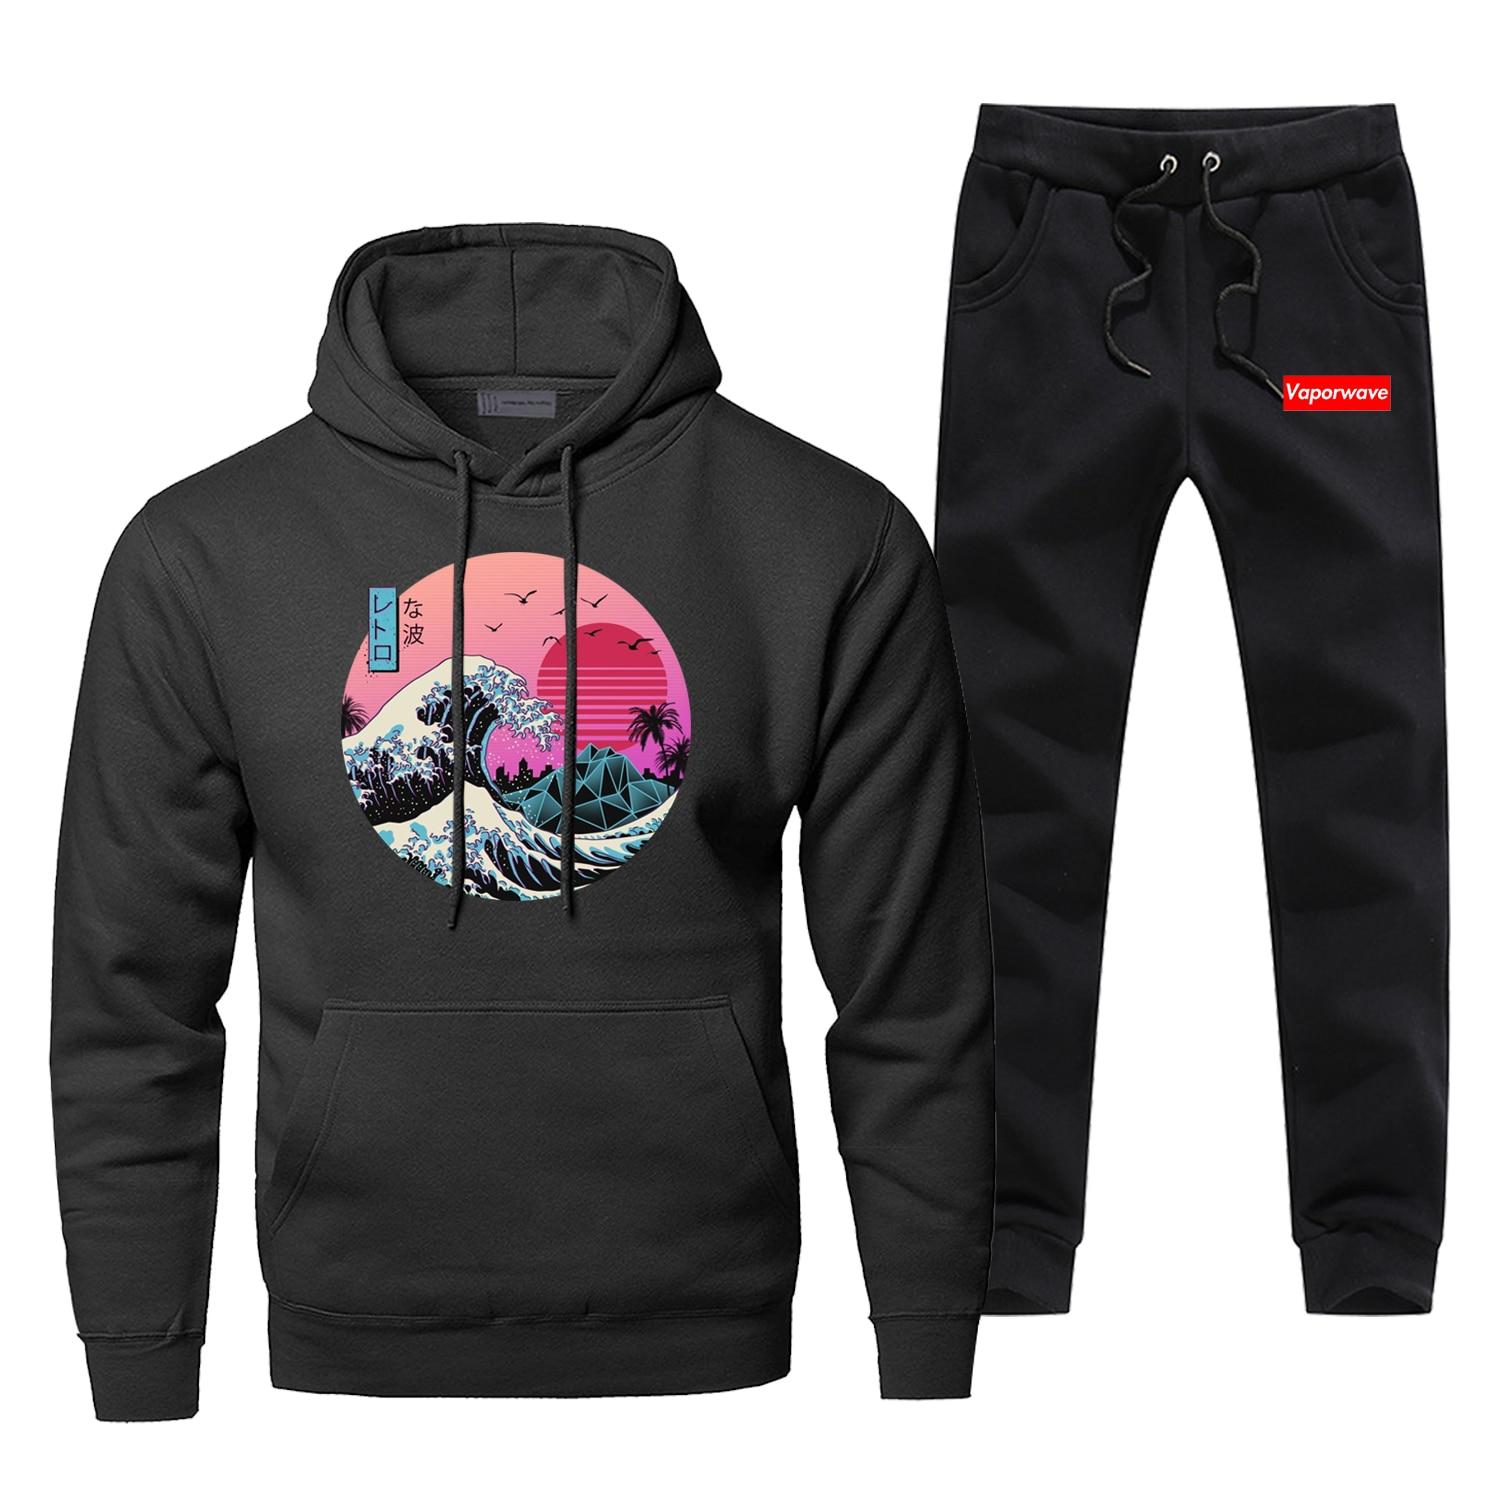 Classic The Great Retro Wave Japan Anime Hoodies+pants Sets Sweatshirt Harajuku Streetwear Men Vaporwave Funny Sportswear